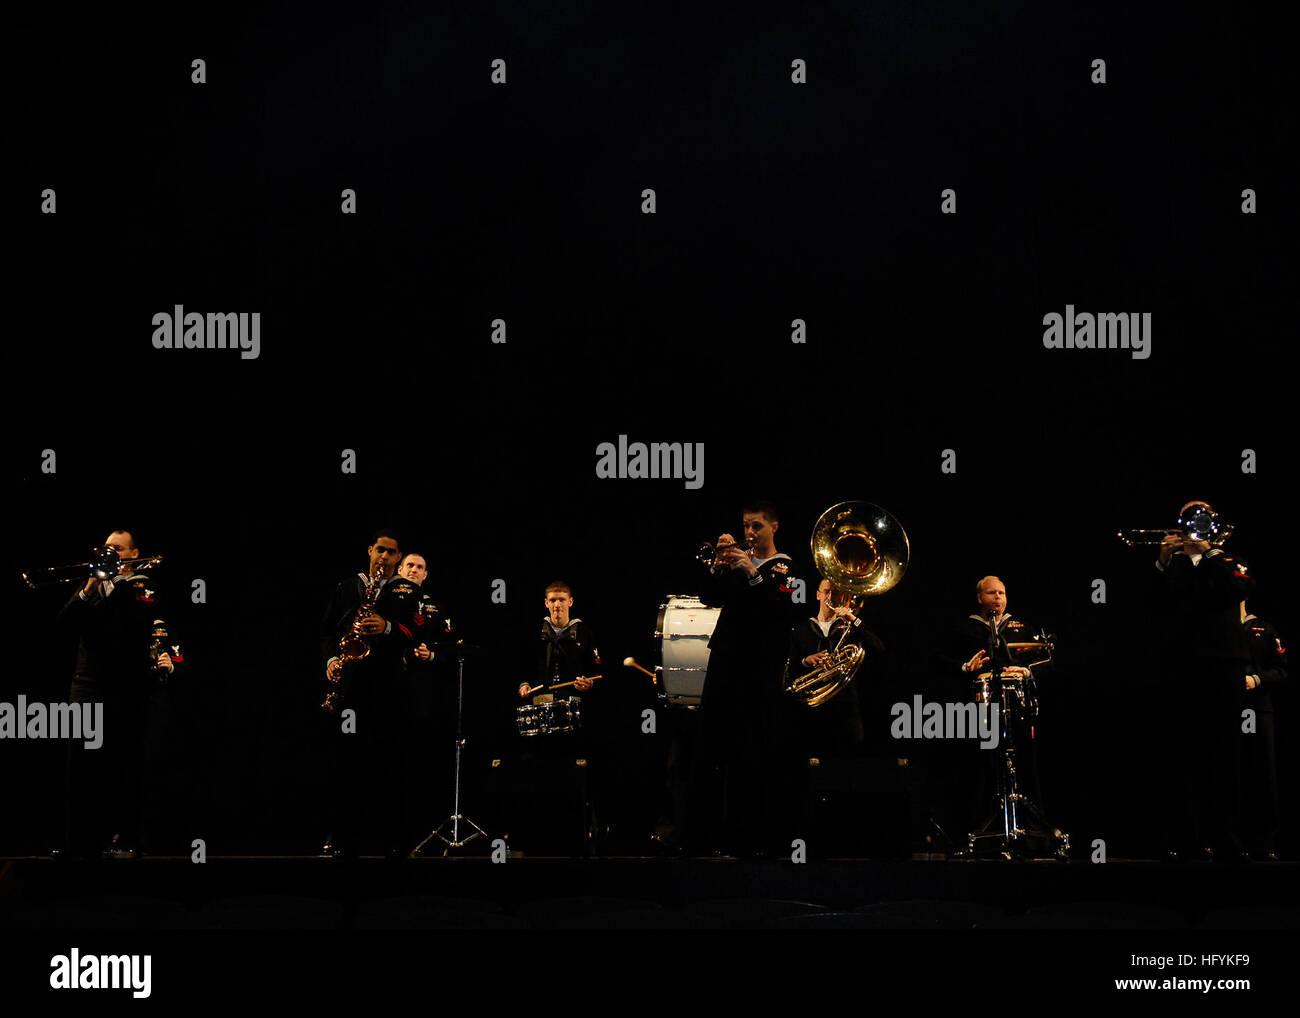 110211-N-MU720-011 YOKOHAMA, Japan (Feb. 11, 2011) The U.S. 7th Fleet Orient Express Brass band conducts a sound - Stock Image